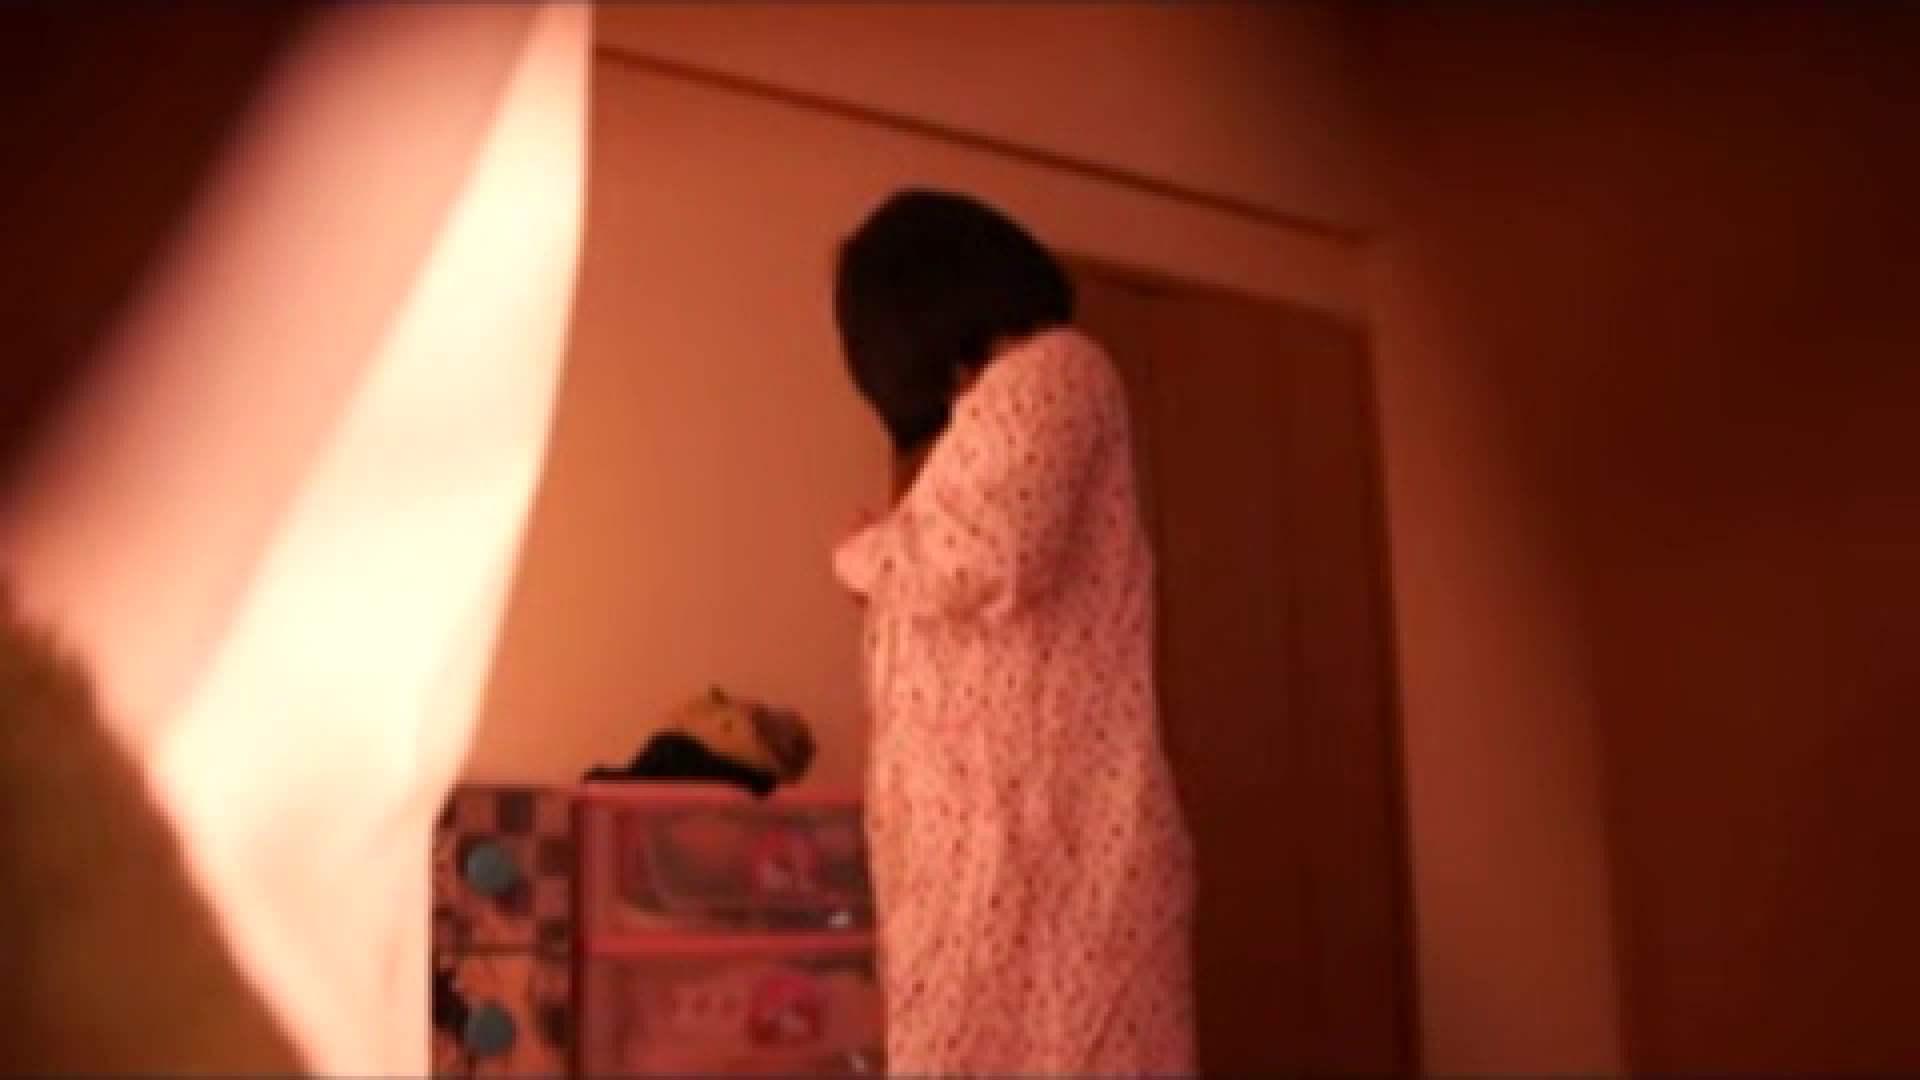 vol.2 まりこさんのお着替え、就寝前の映像です。 アラ30 戯れ無修正画像 71画像 53